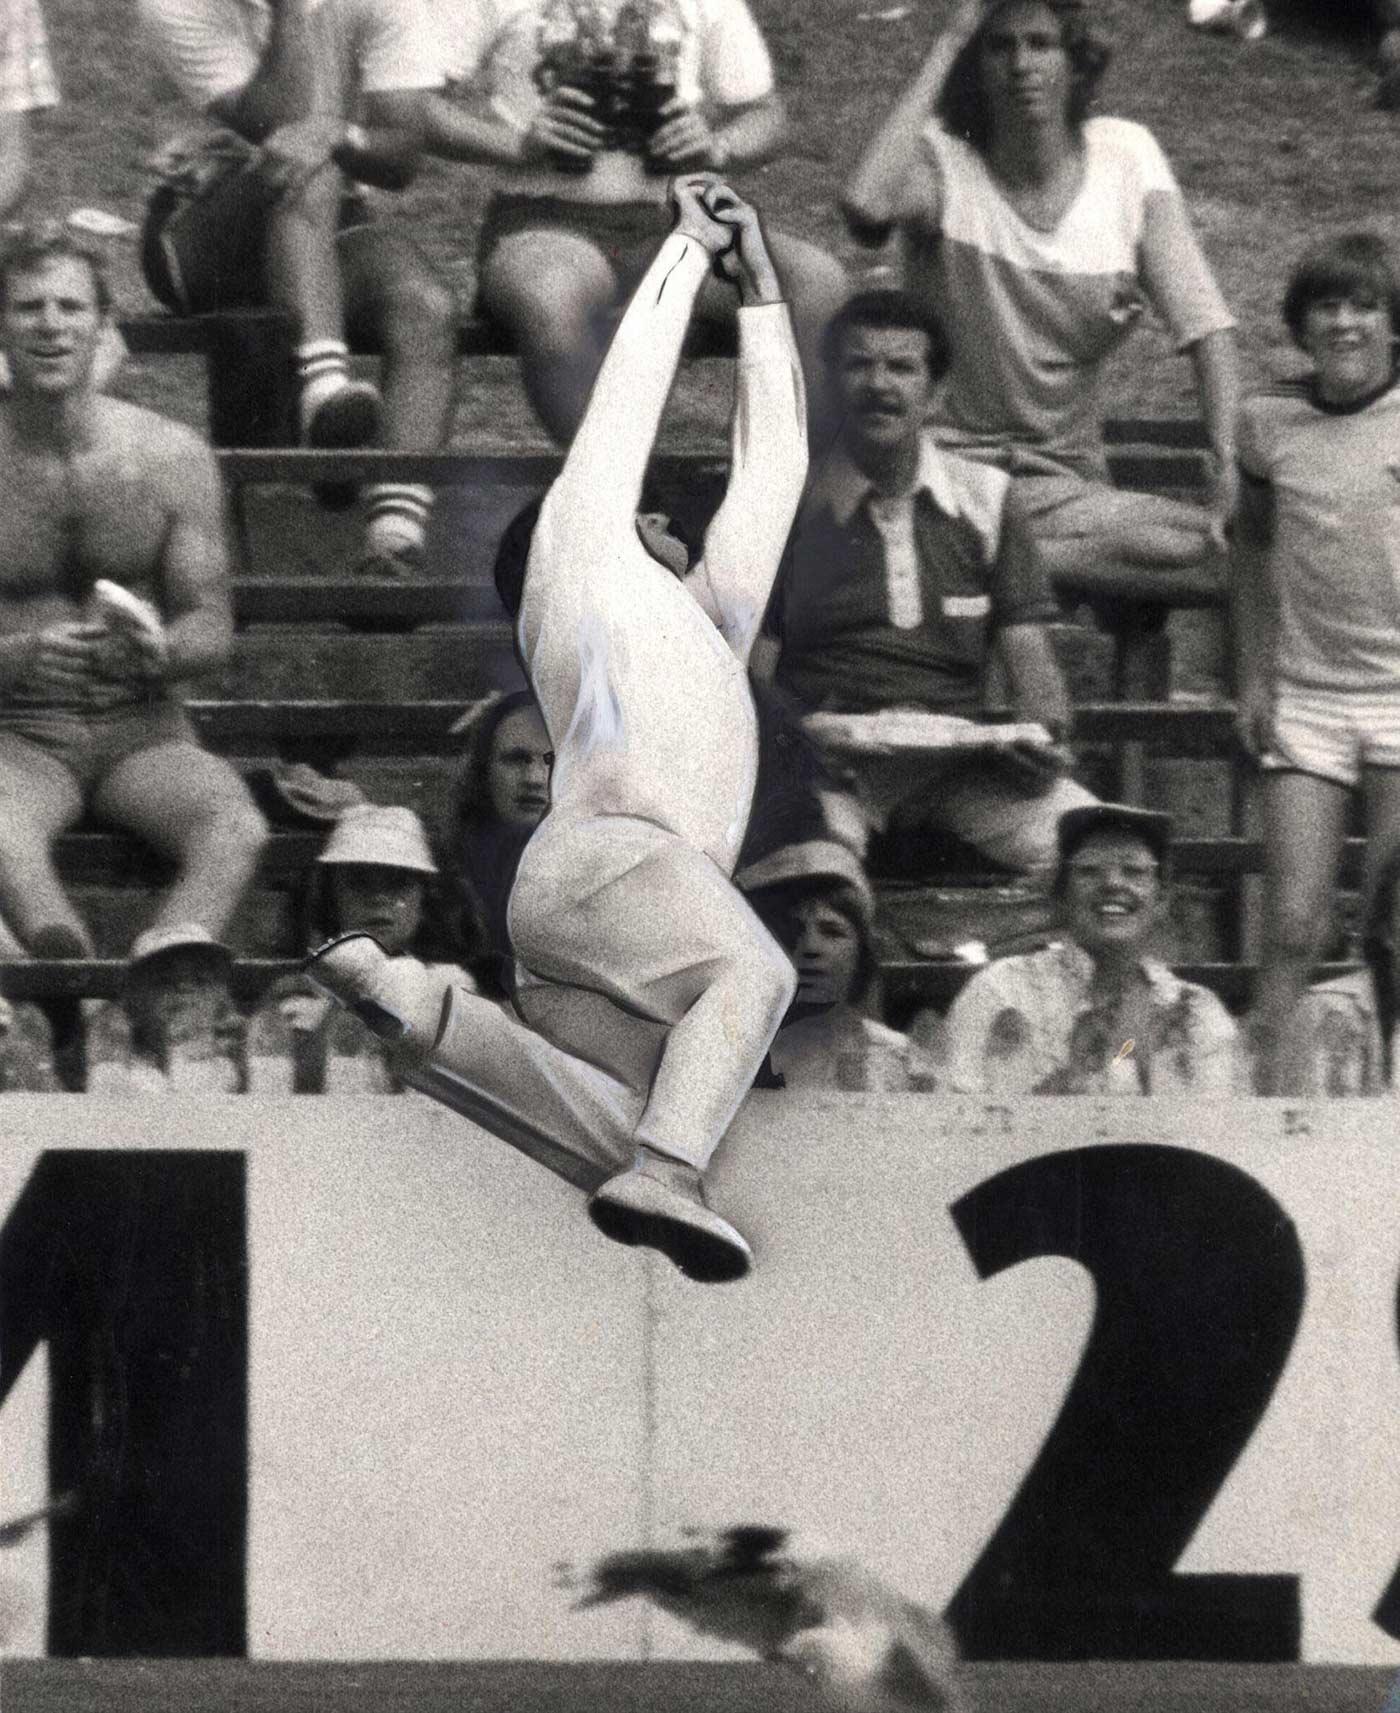 Clarke c Dyson, Sydney 1981